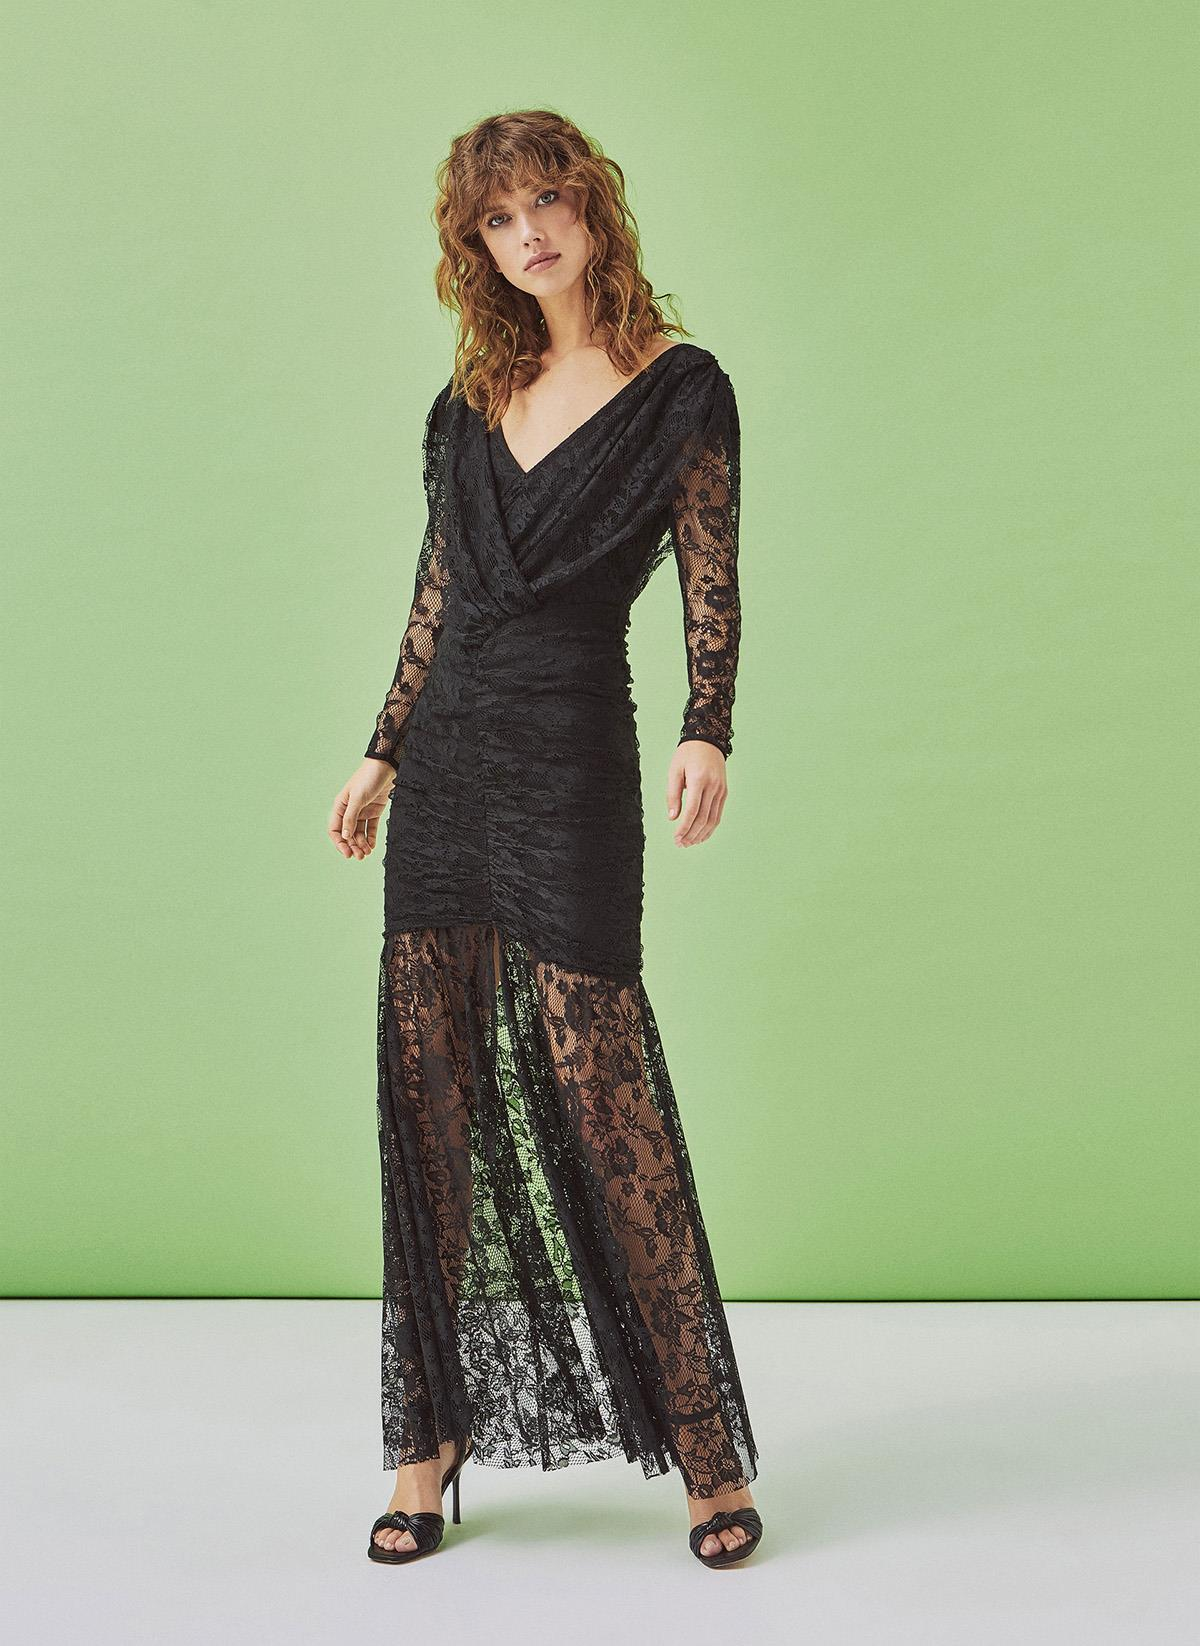 72f57023cd7 1-vestido-encaje-negro-feria-uterque. Vestido de encaje negro